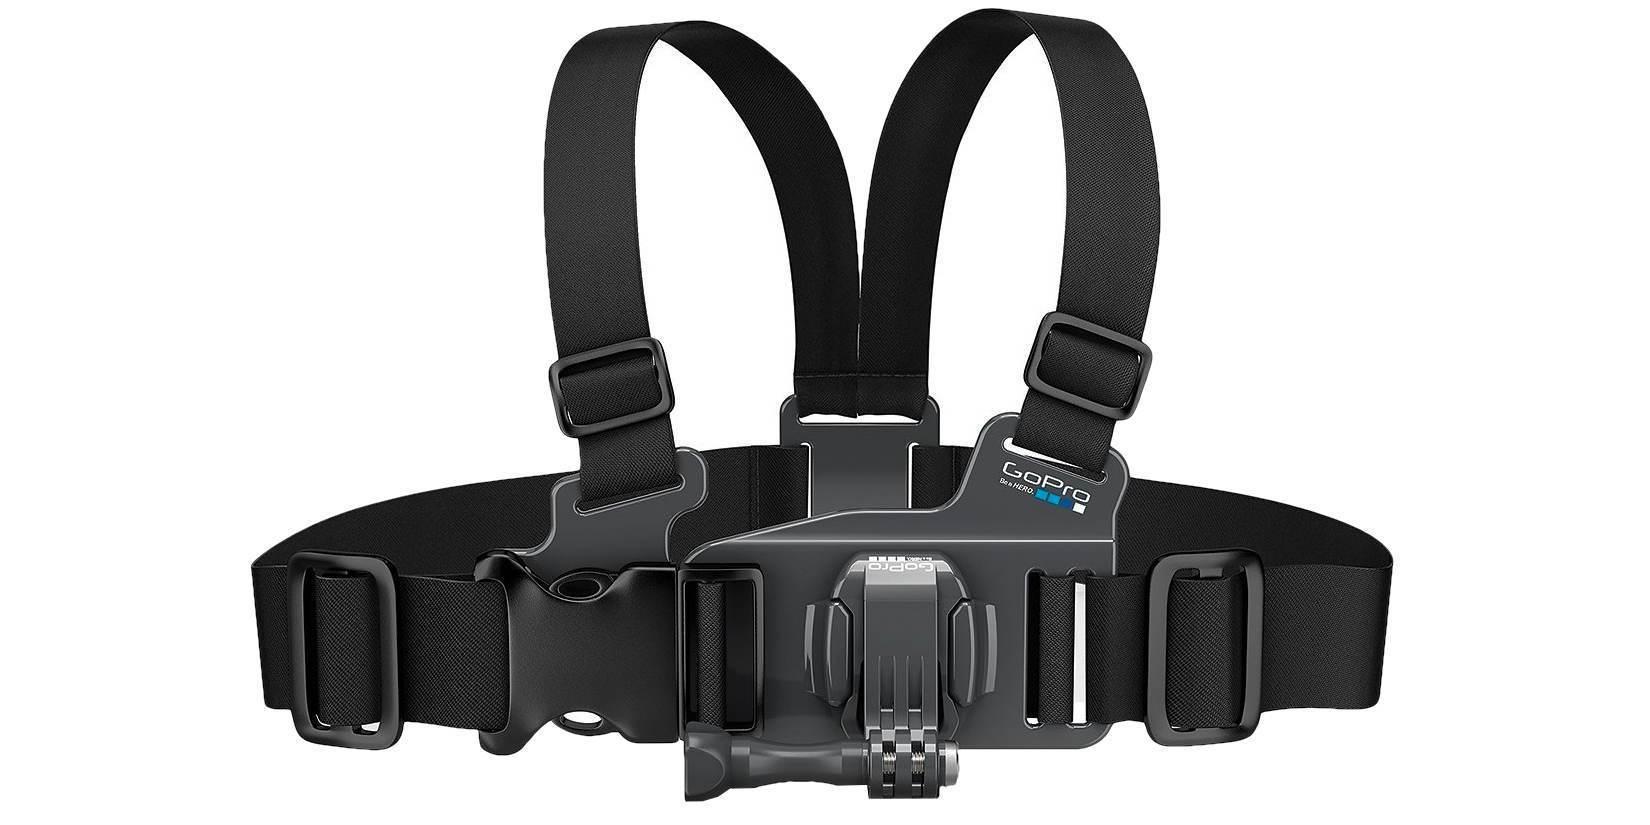 Детское крепление на грудь GoPro Jr. Chesty: Chest Harness (ACHMJ-301) вид спереди